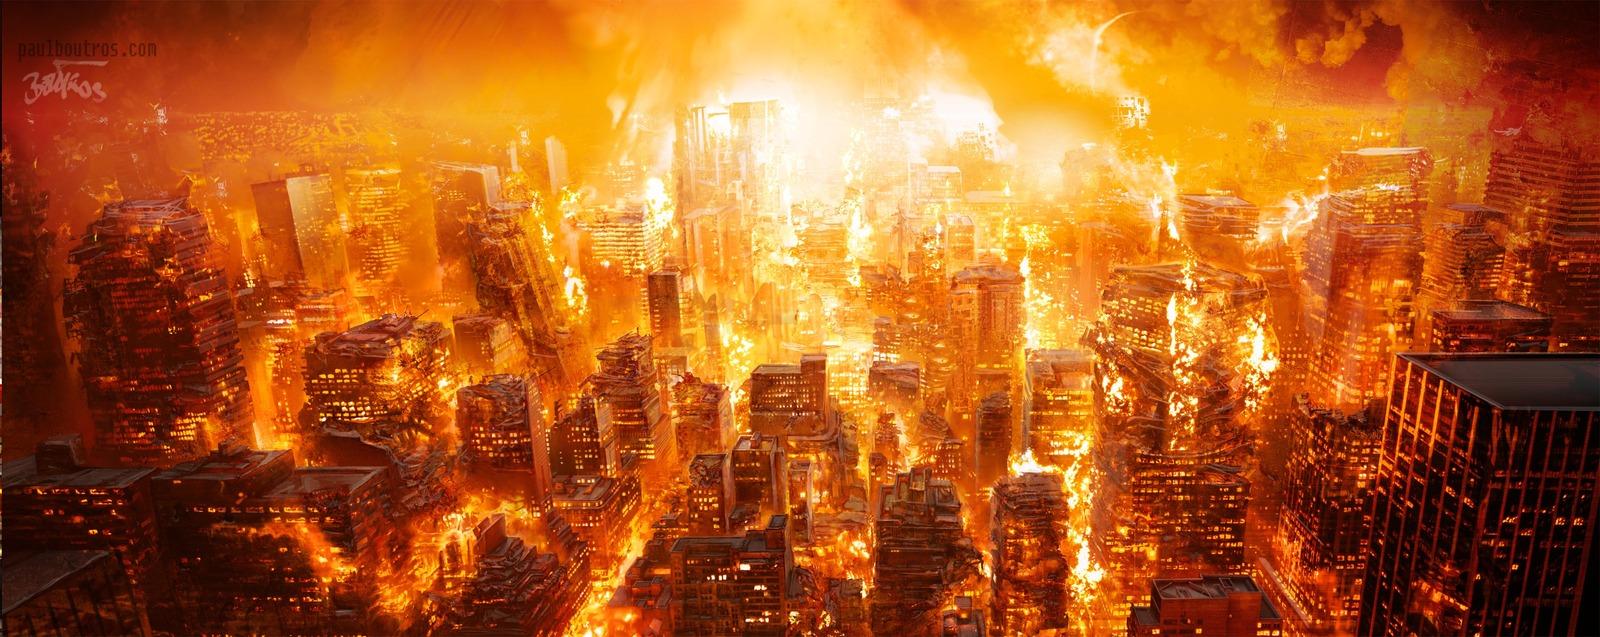 miesto gaisras 2